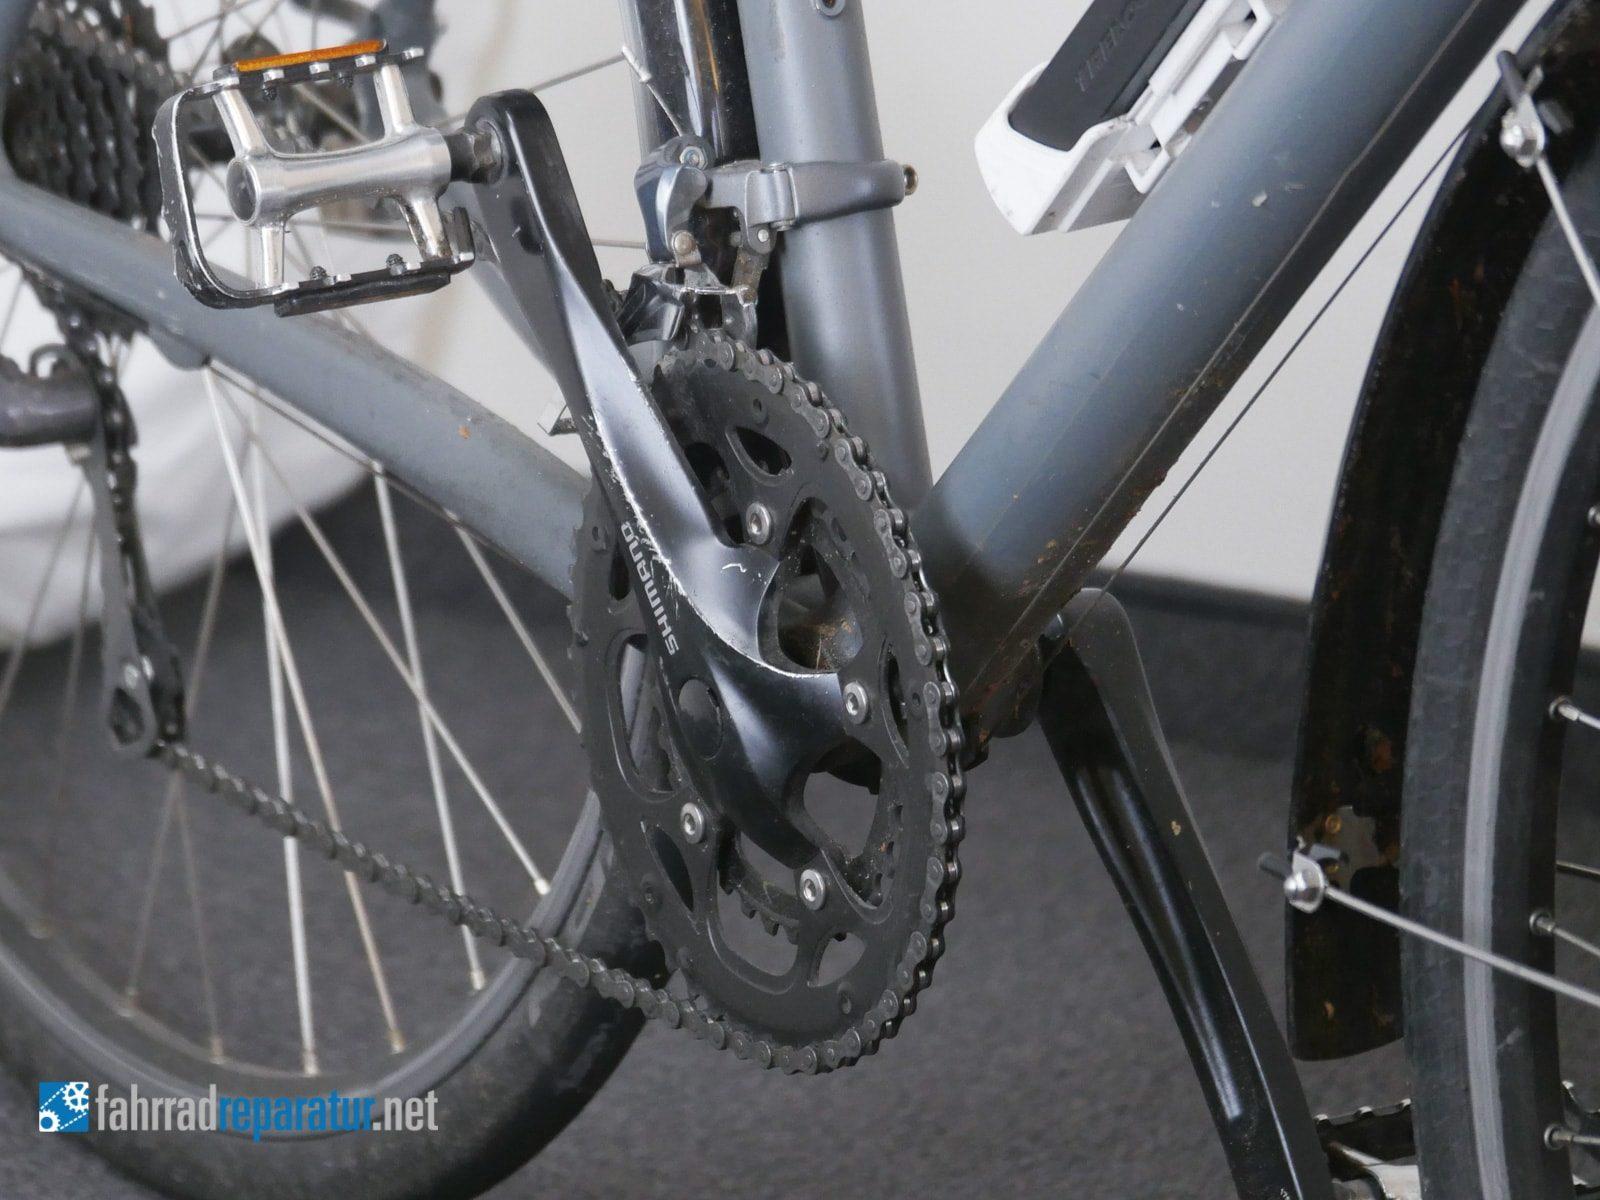 fahrradschaltung 1 fach gegen x fach schaltungen. Black Bedroom Furniture Sets. Home Design Ideas